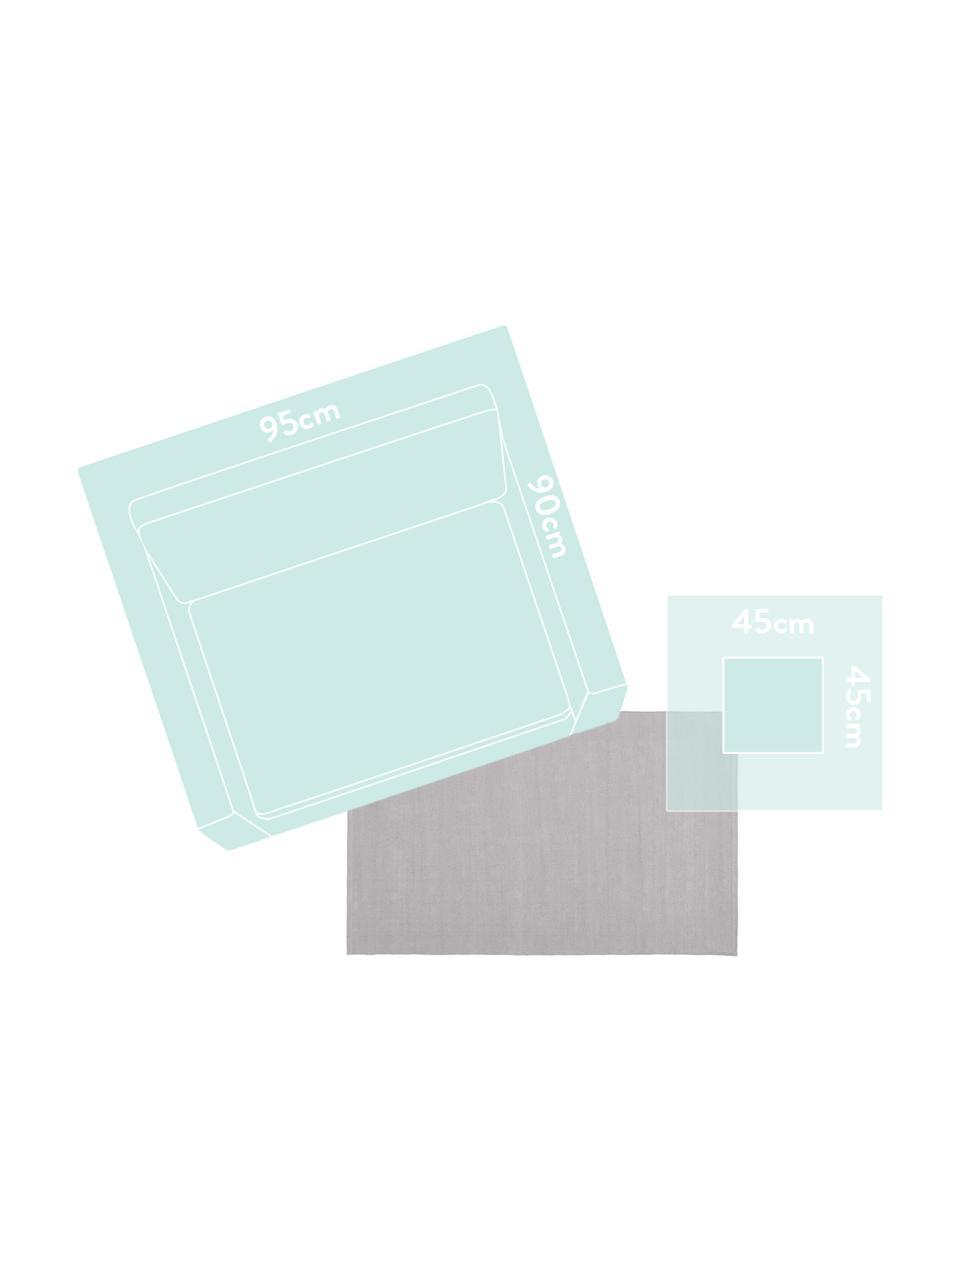 Dünner Baumwollteppich Agneta in Grau, handgewebt, 100% Baumwolle, Grau, B 200 x L 300 cm (Größe L)